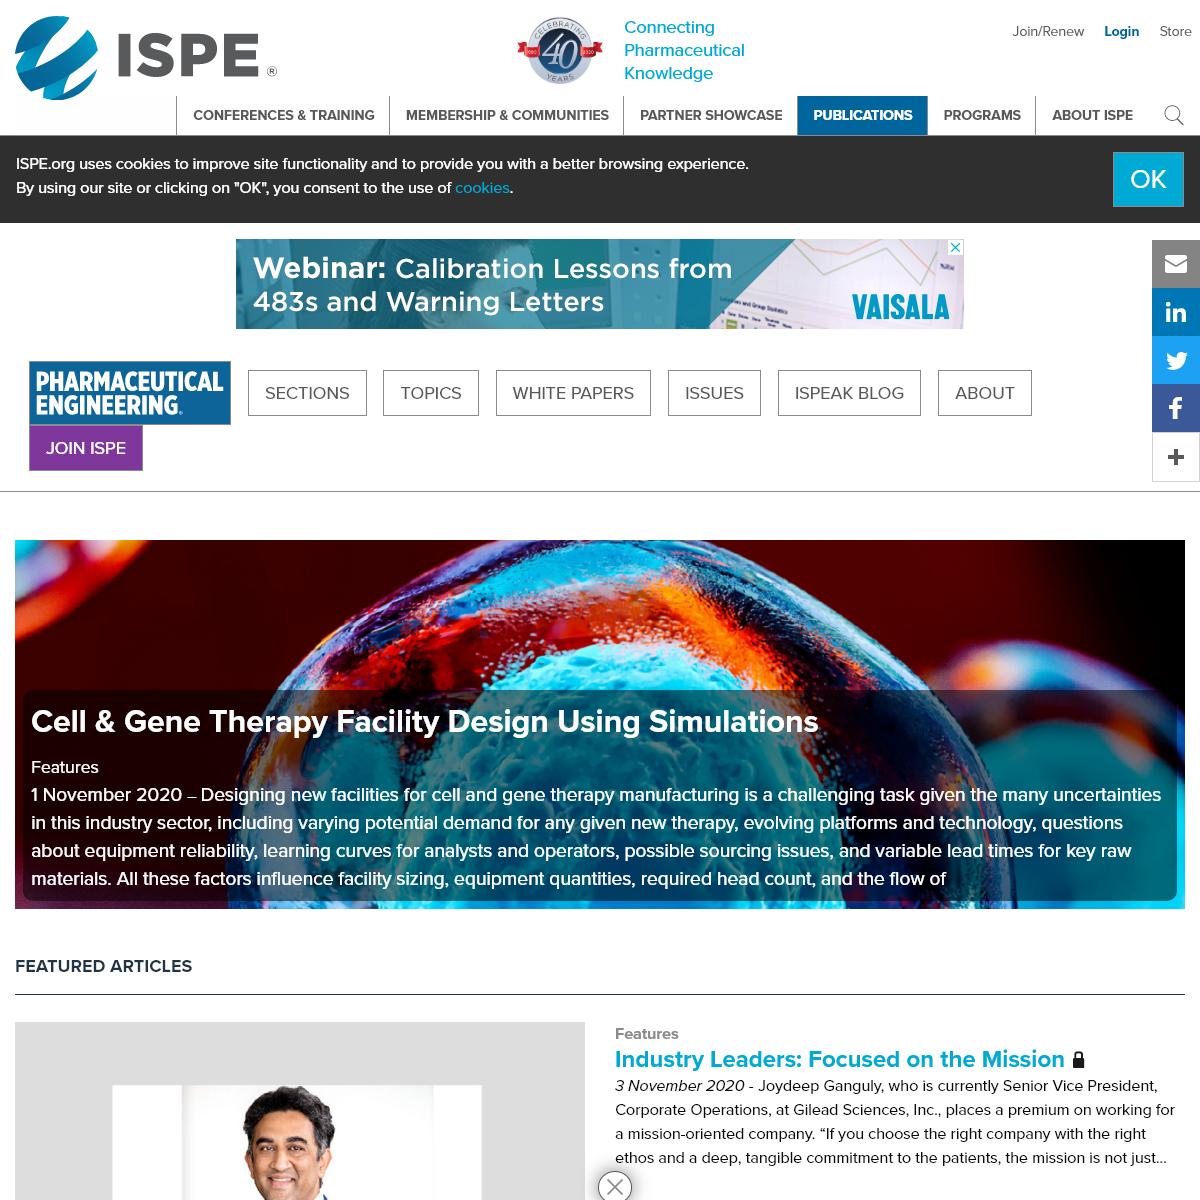 Pharmaceutical Engineering Home - ISPE - International Society for Pharmaceutical Engineering